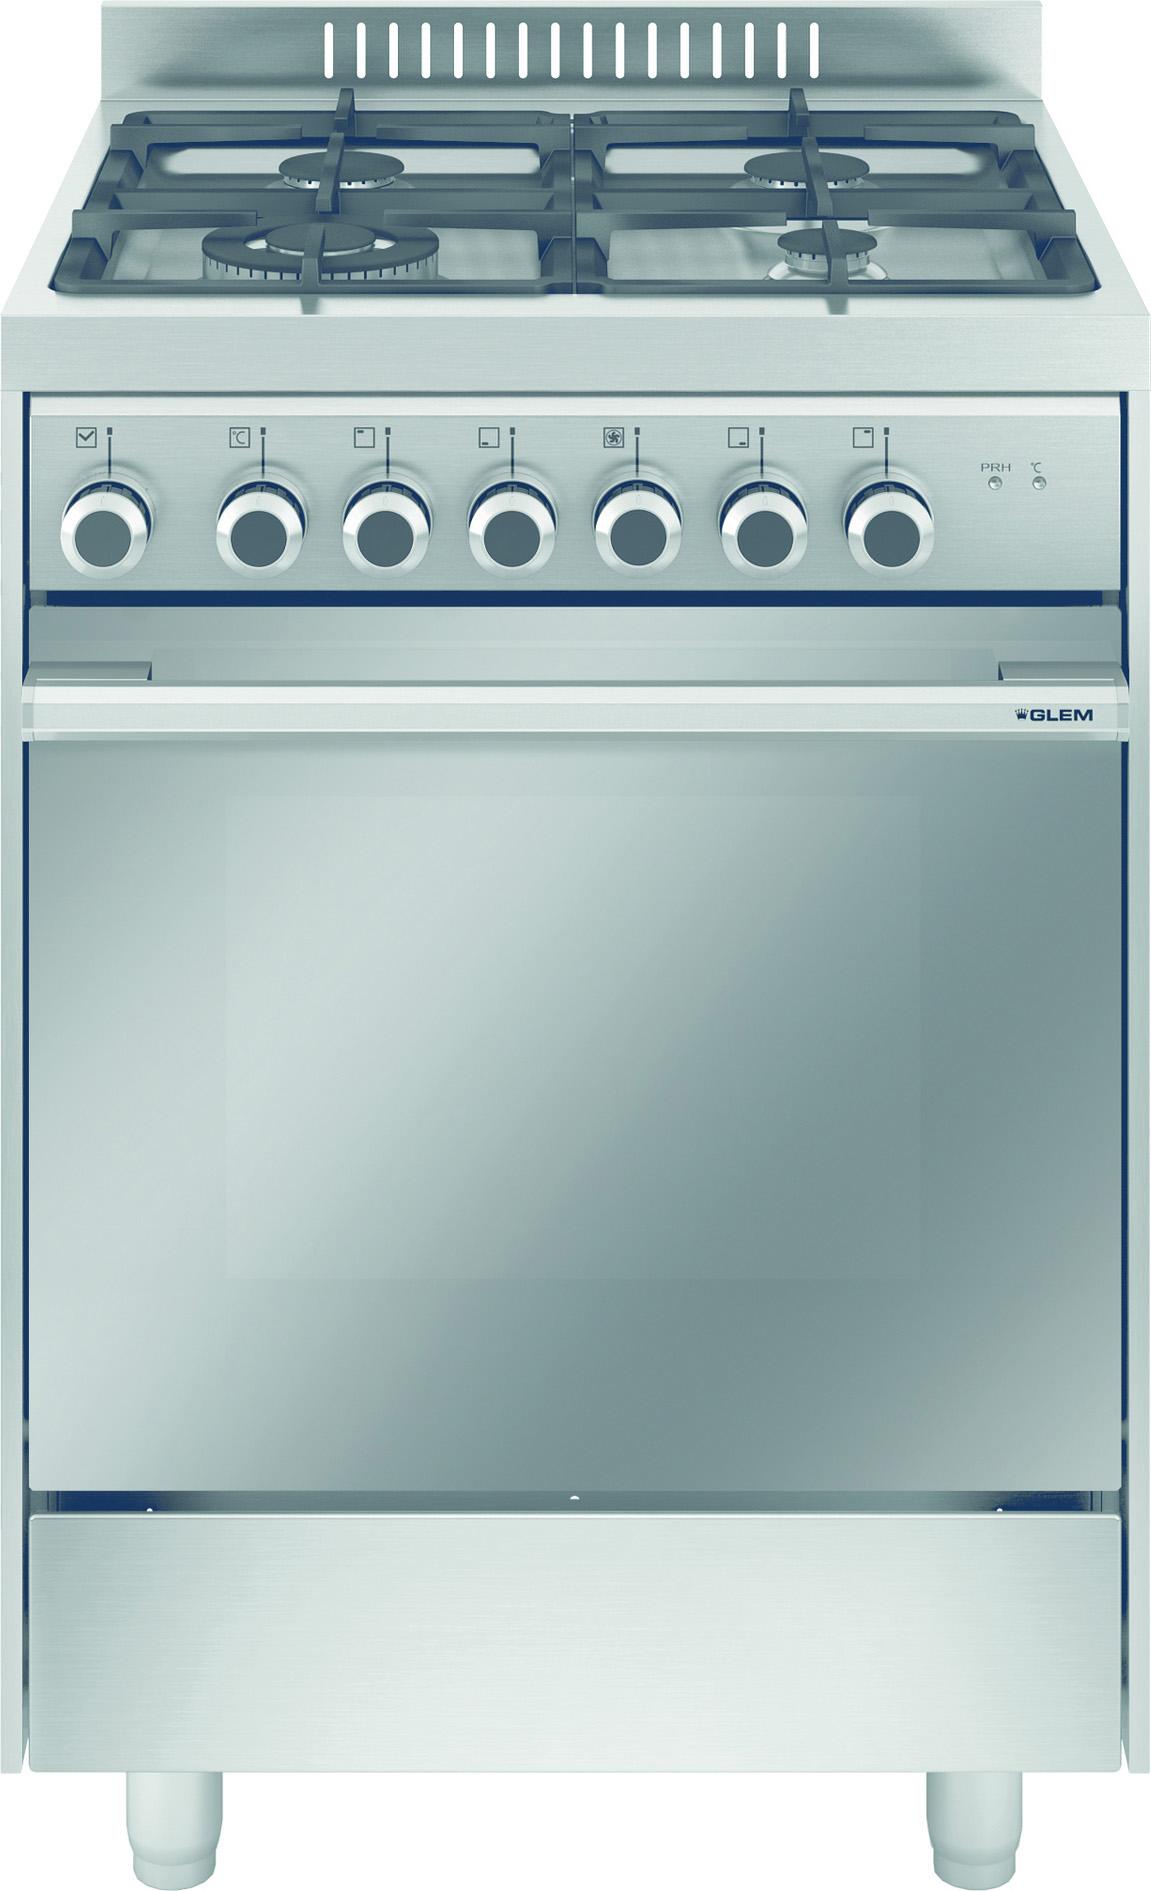 Glem gas cucina a gas 4 fuochi forno elettrico - Consumo gas cucina ...